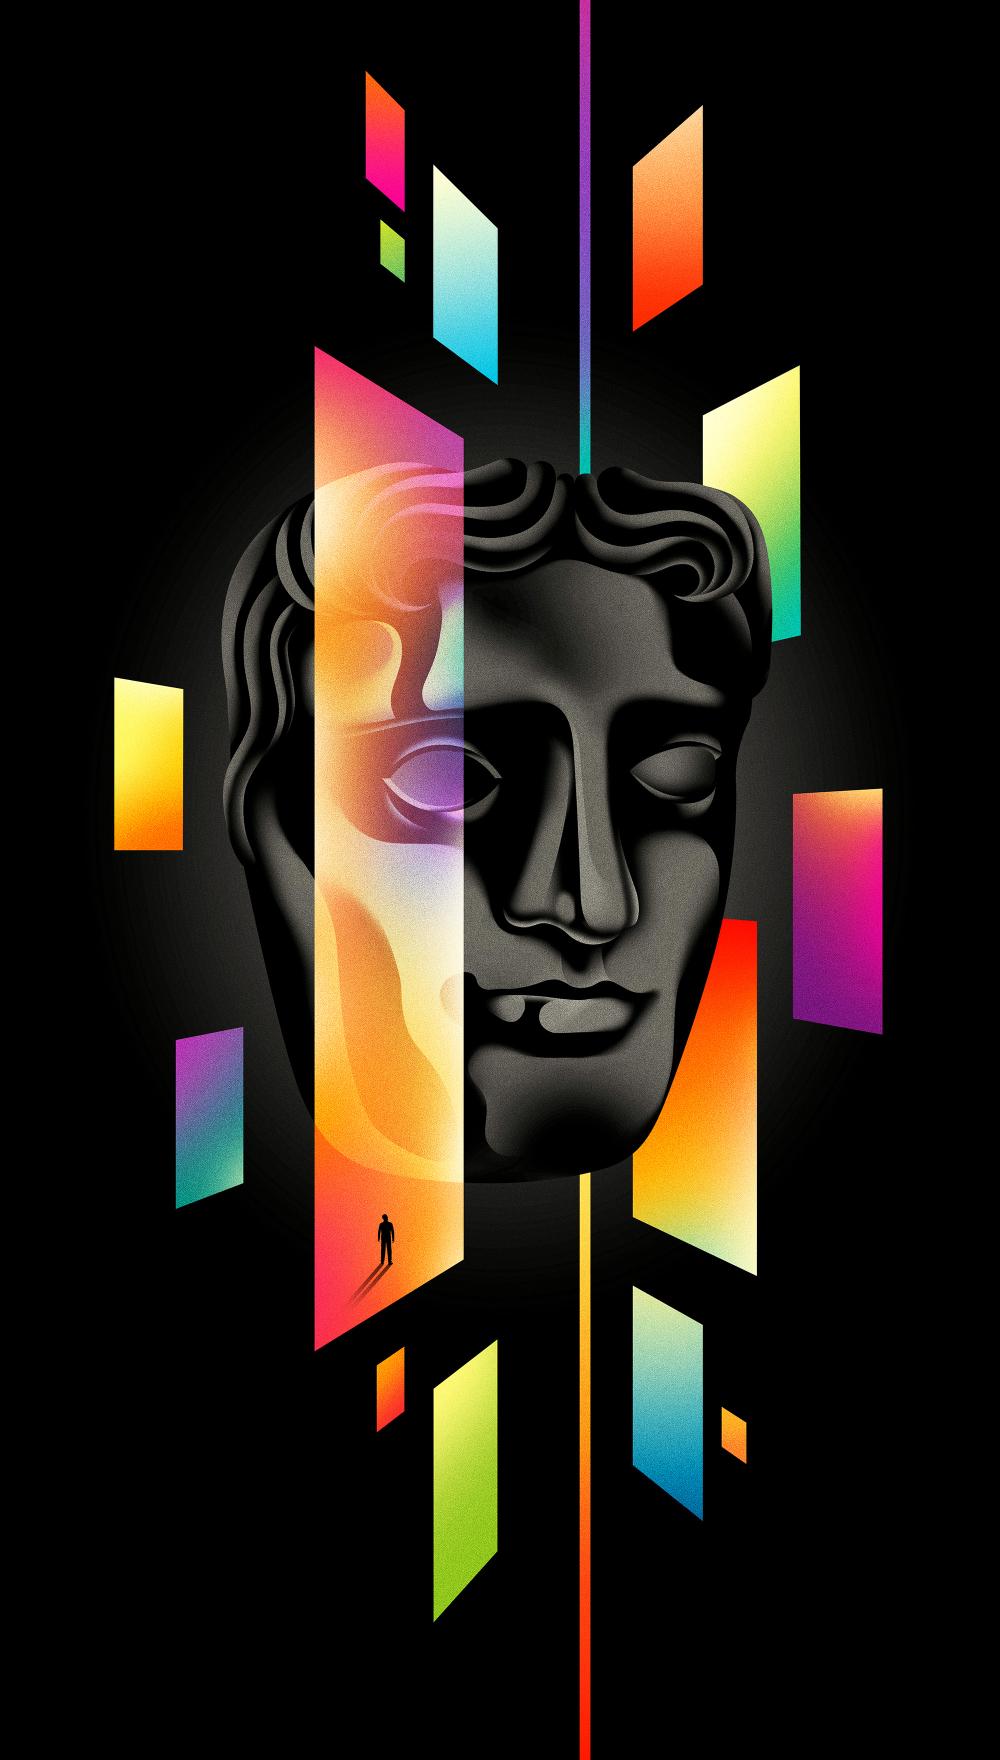 Bafta Television Awards Poster By La Boca Award Poster Graphic Arts Illustration Vintage Graphic Design